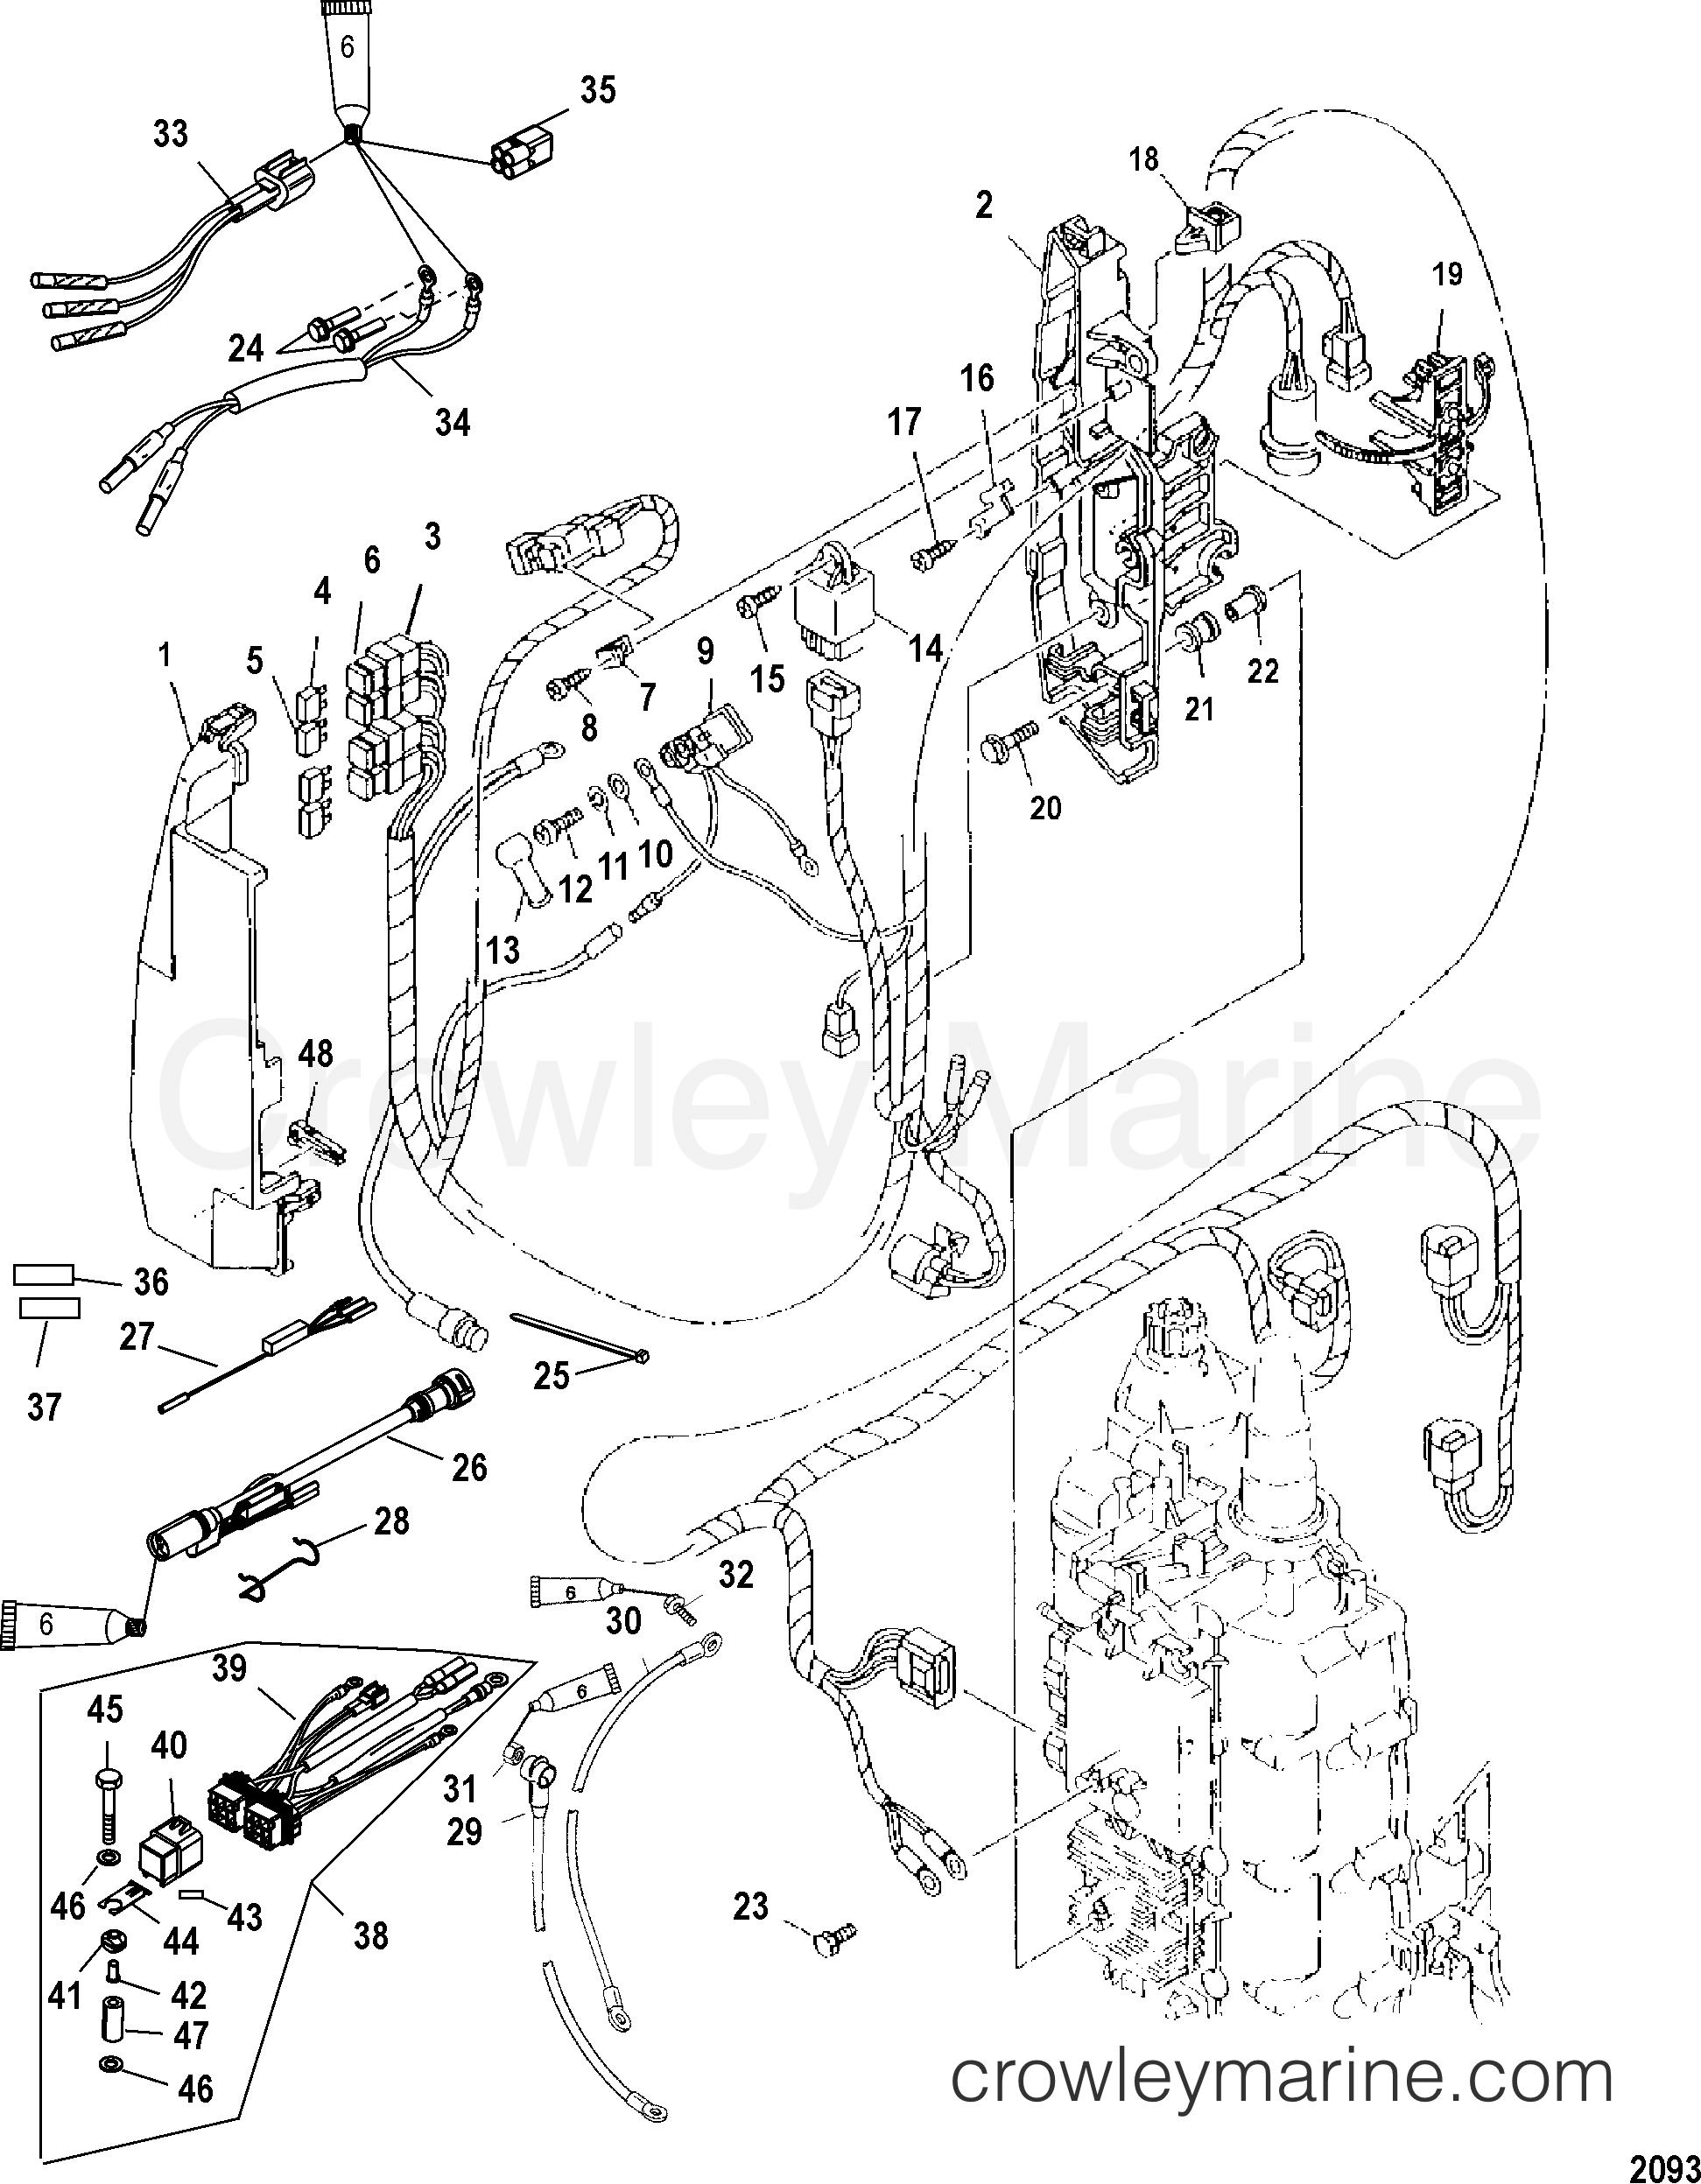 Mariner Outboard Wiring Diagram 2004 Reinvent Your Electrical Components 115efi Elpt 4 Rh Crowleymarine Com Mercury Force